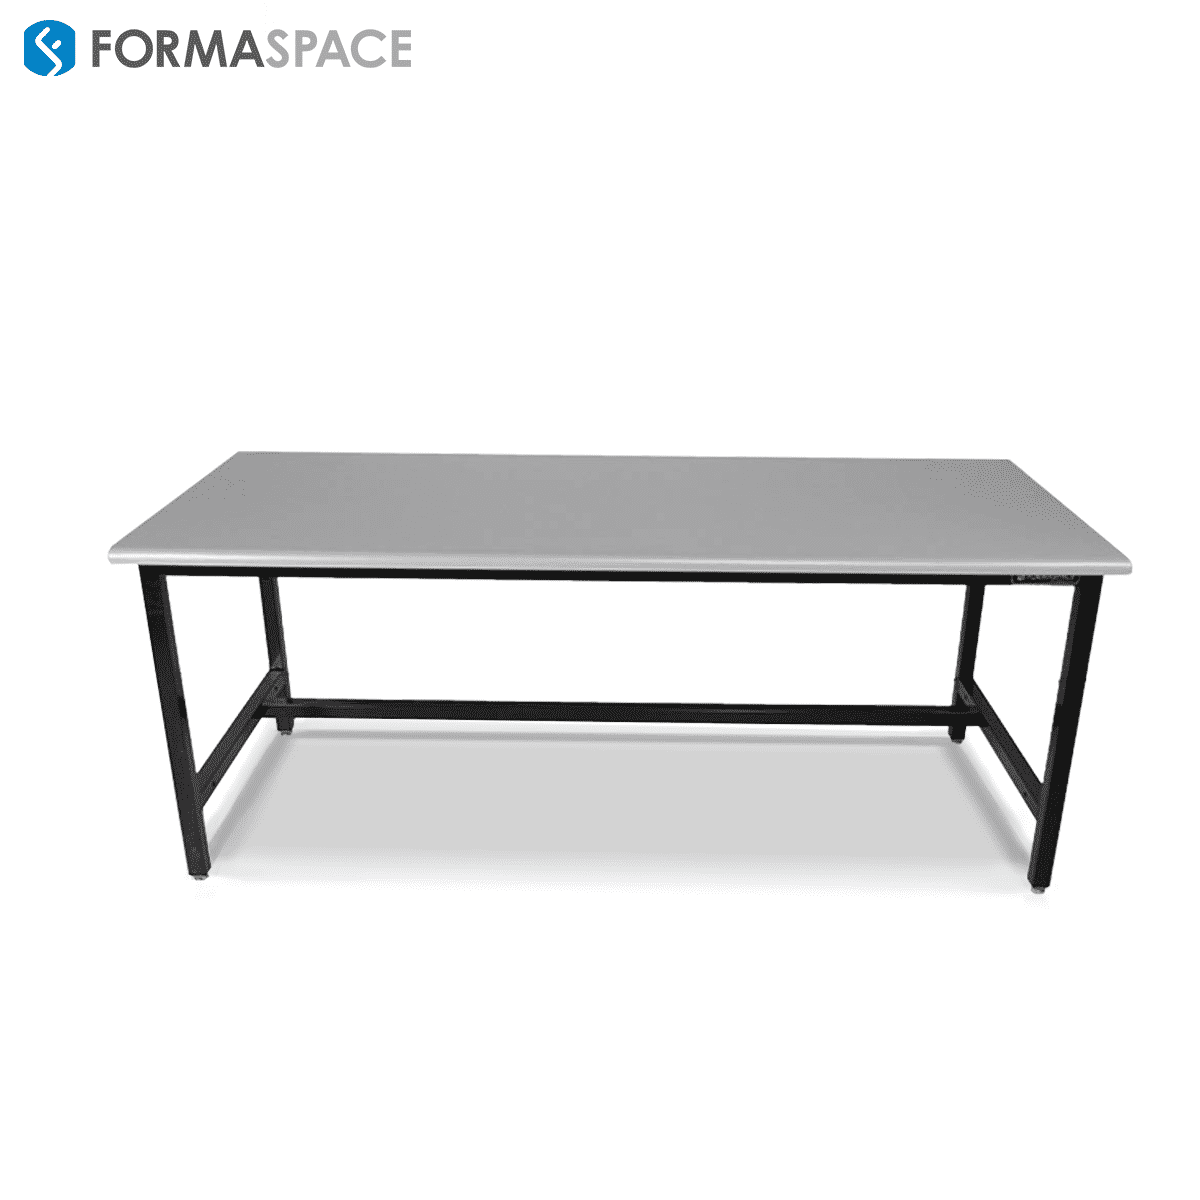 Basix workbench with gray laminate countertop